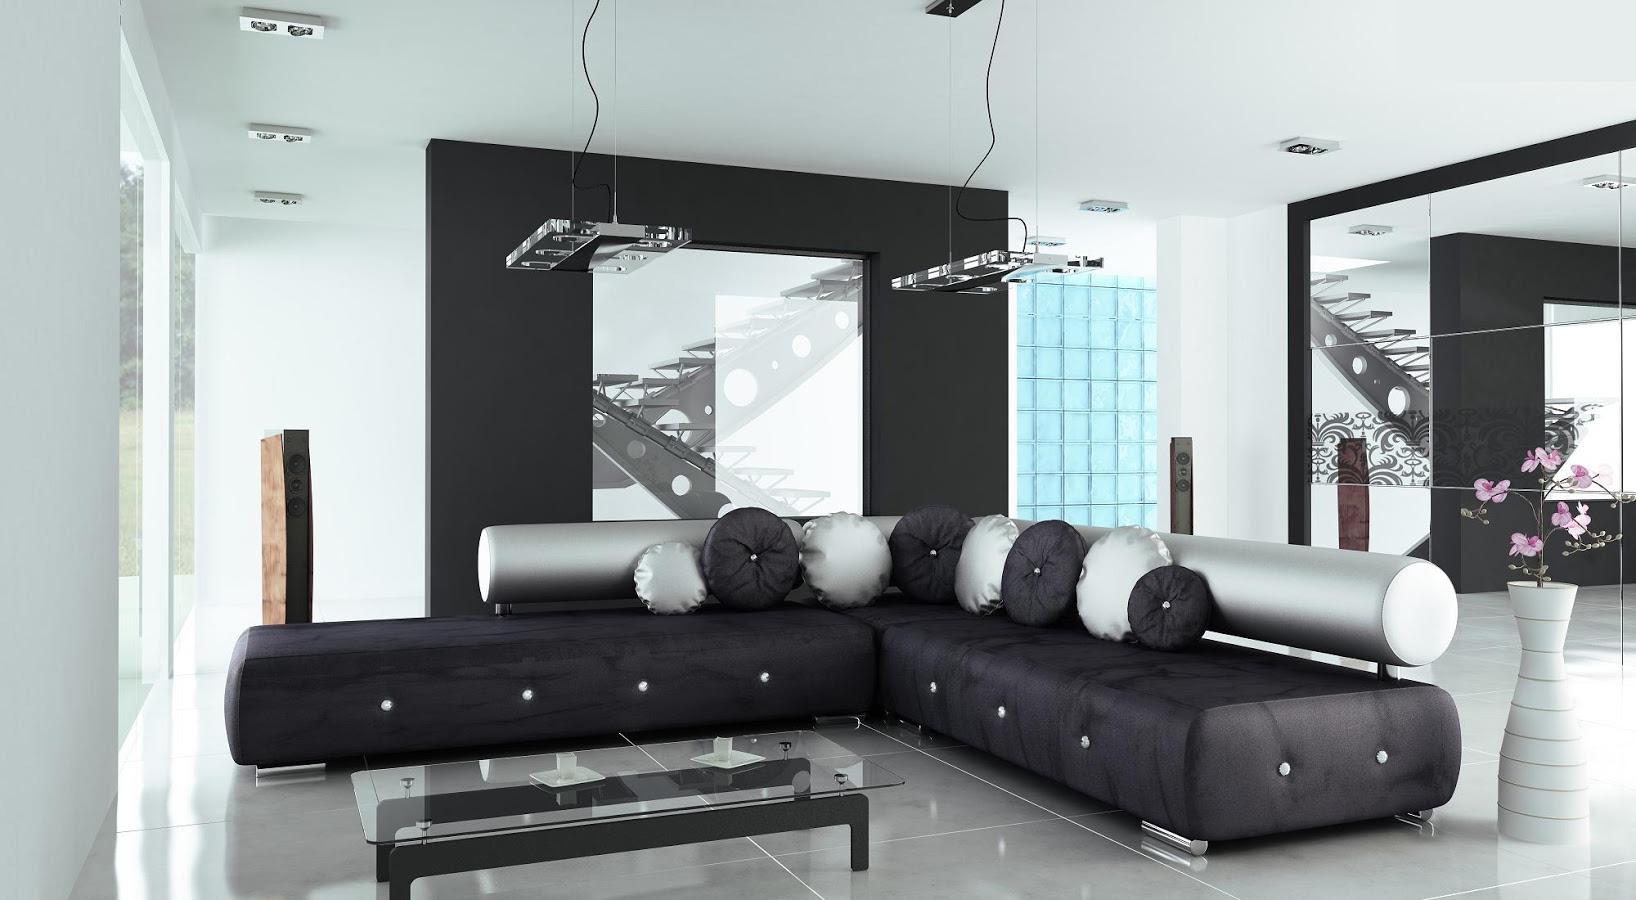 diamant meubelen. Black Bedroom Furniture Sets. Home Design Ideas